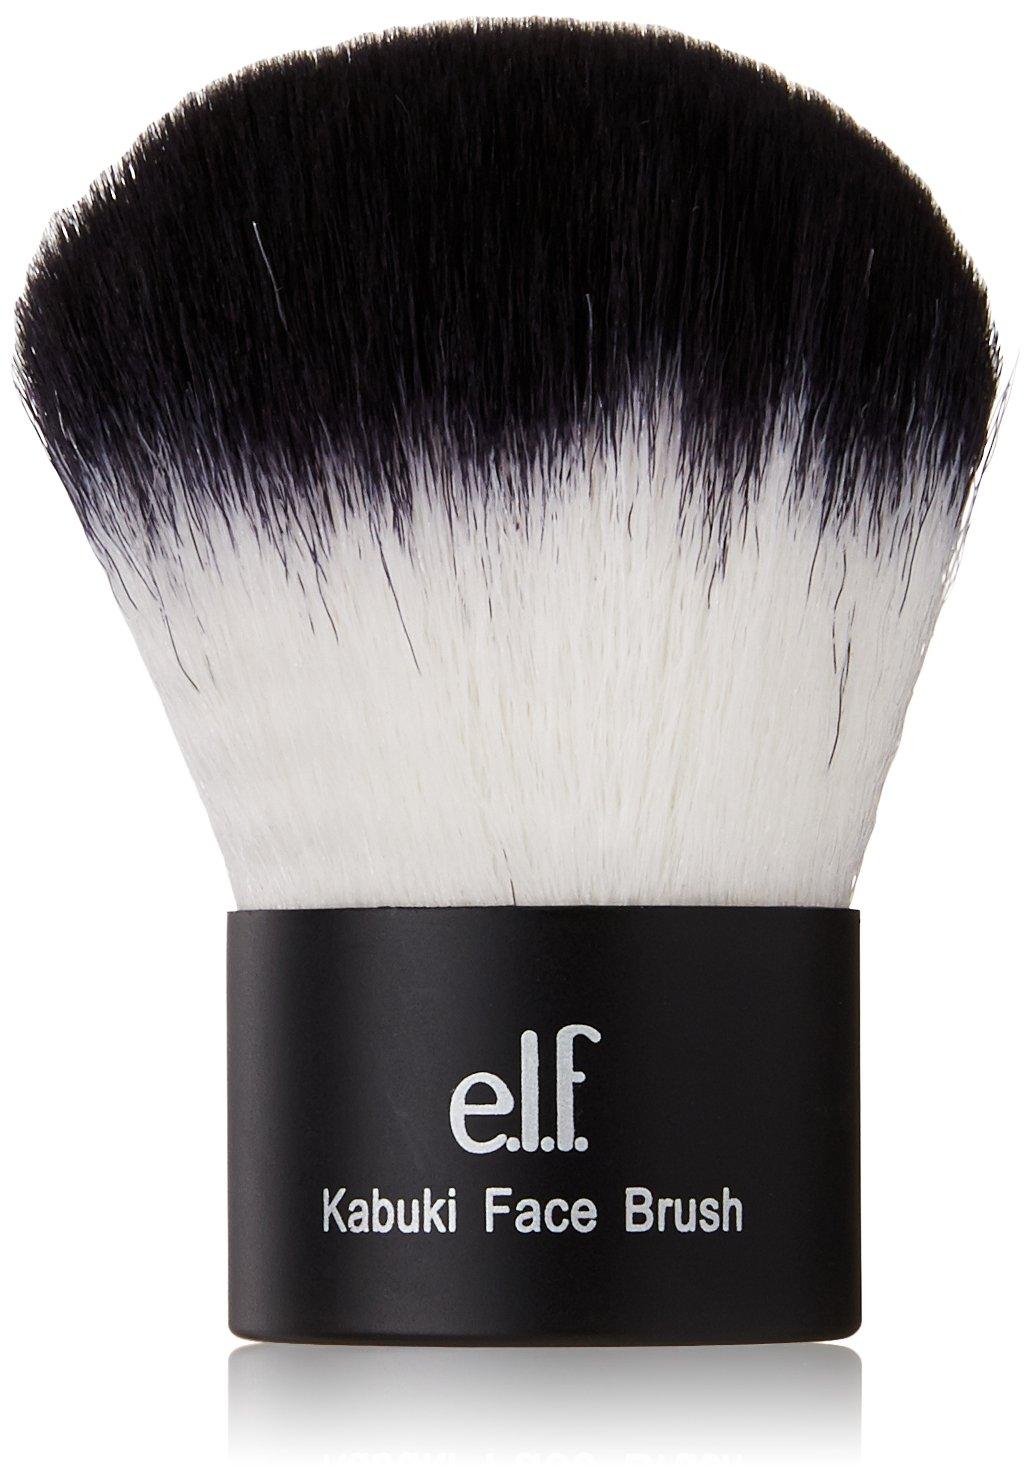 e.l.f. Studio kabuki face brush JA Cosmetics hfs-koi-zk-a4198